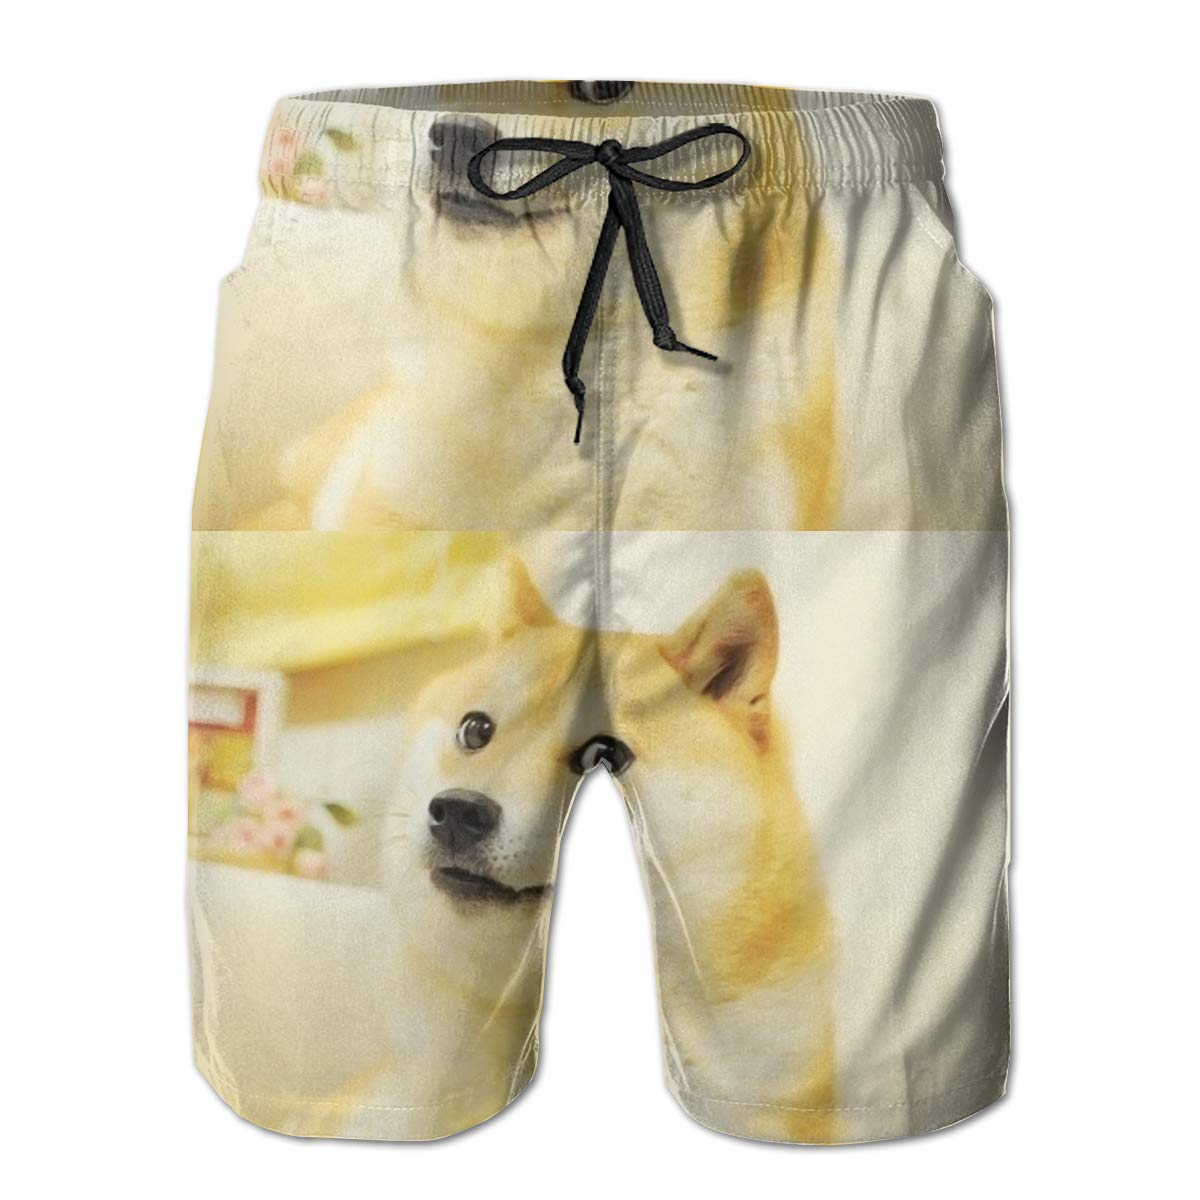 WWT Shiba Inu Mens Fashion Funny Swim Trunks with Mesh Lining//Side Pockets